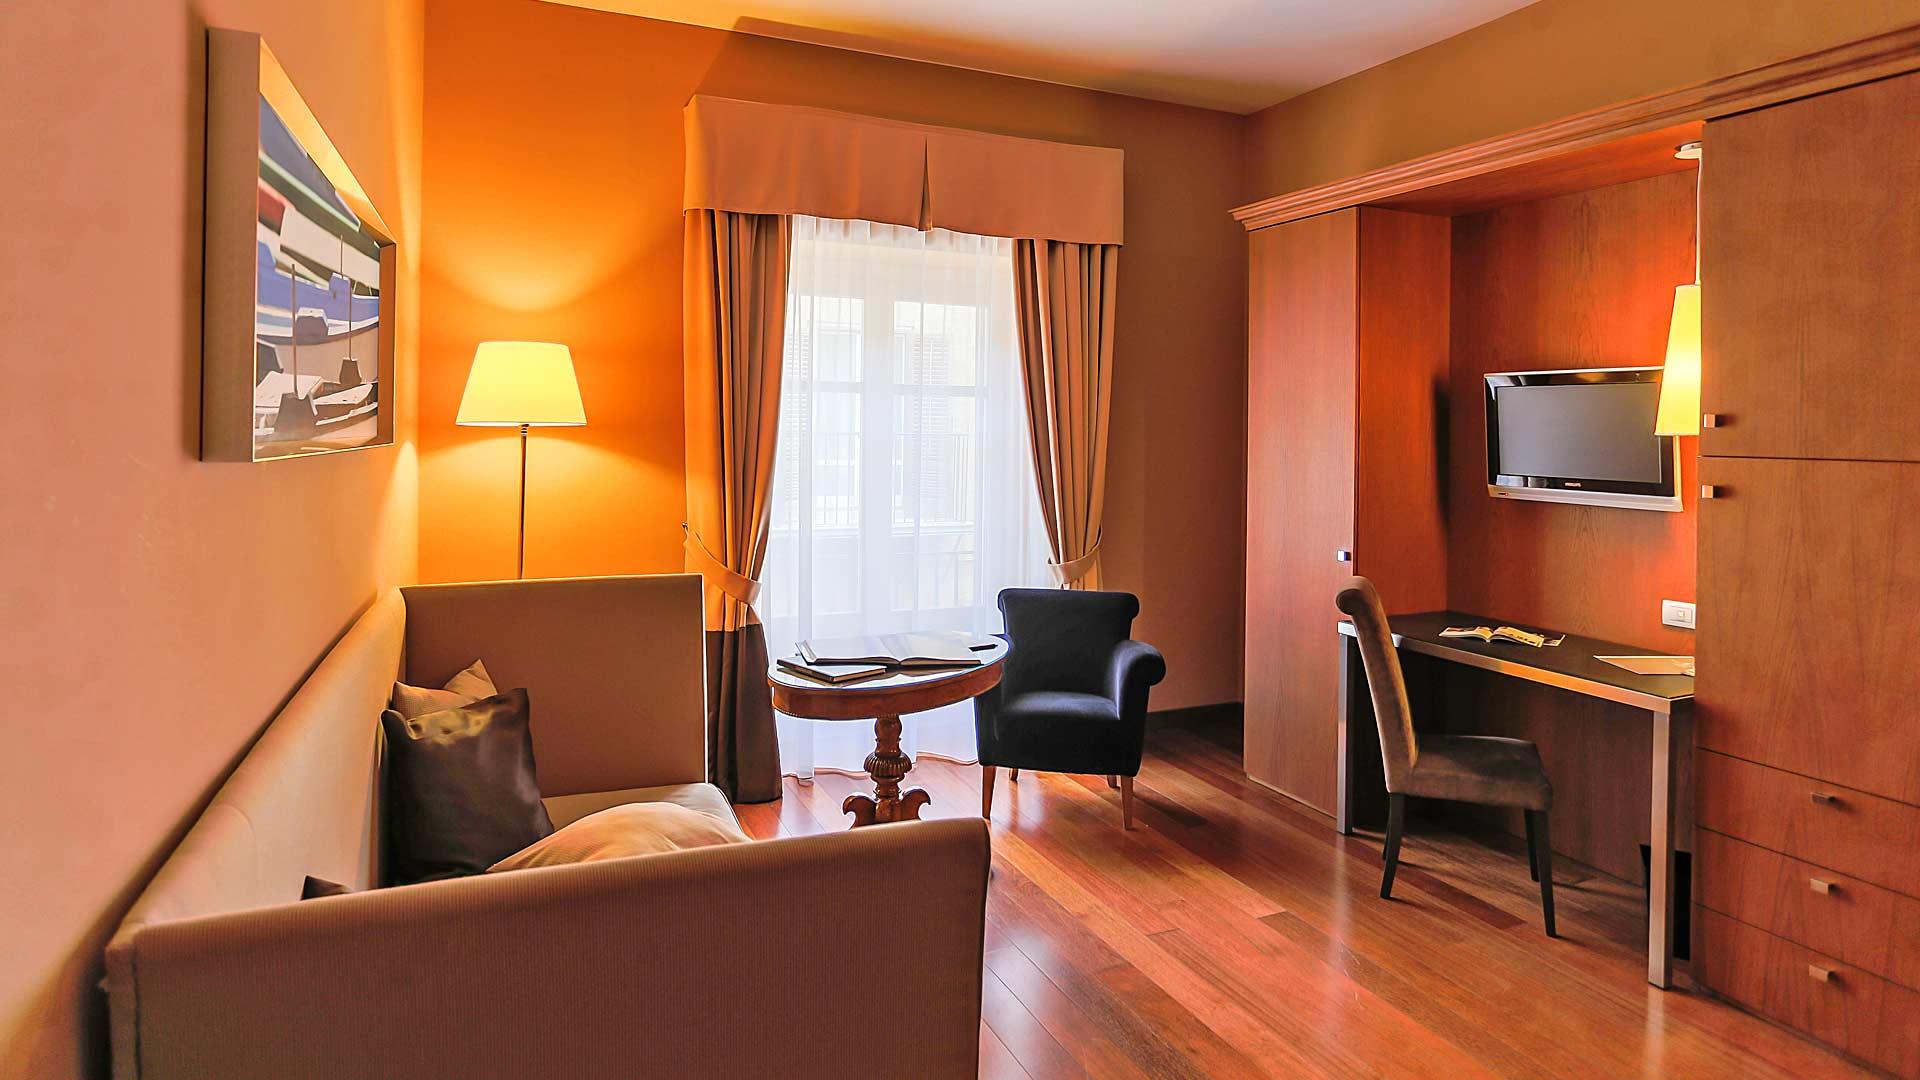 Suites hotel porta felice palermo for Design hotel palermo